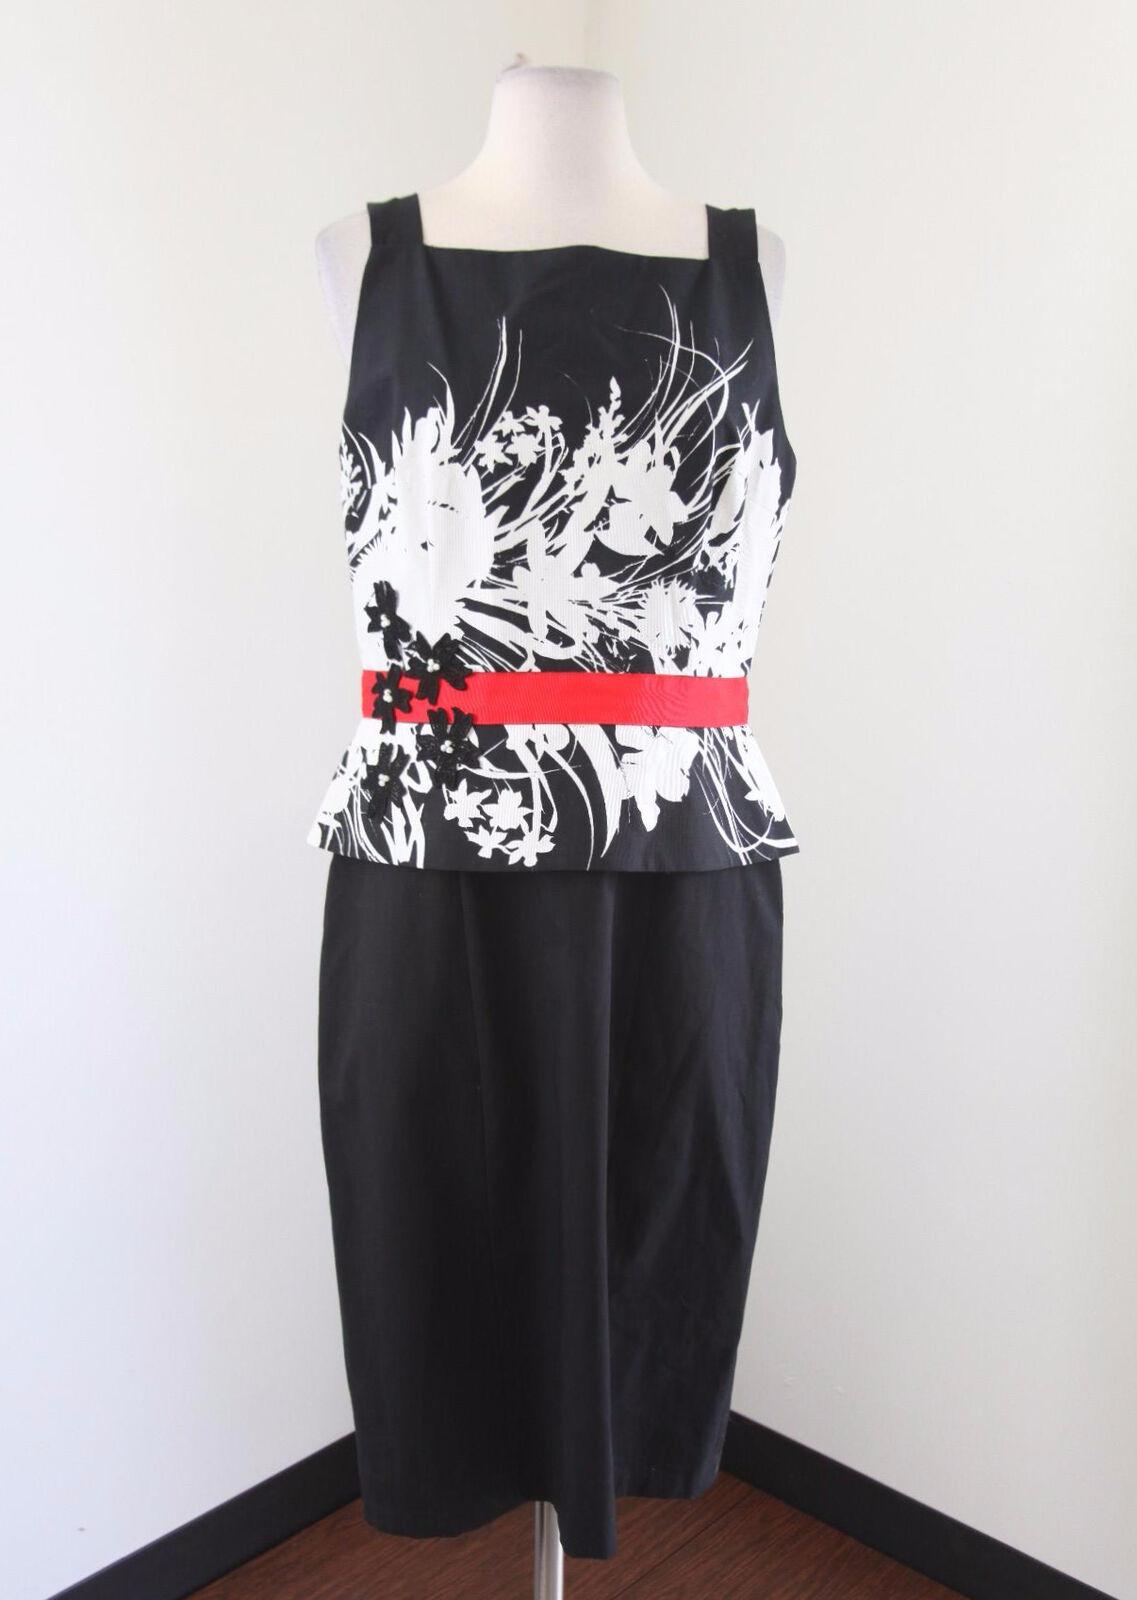 NWT  David Meister schwarz Weiß Floral Print Peplum Dress Größe 10 Career